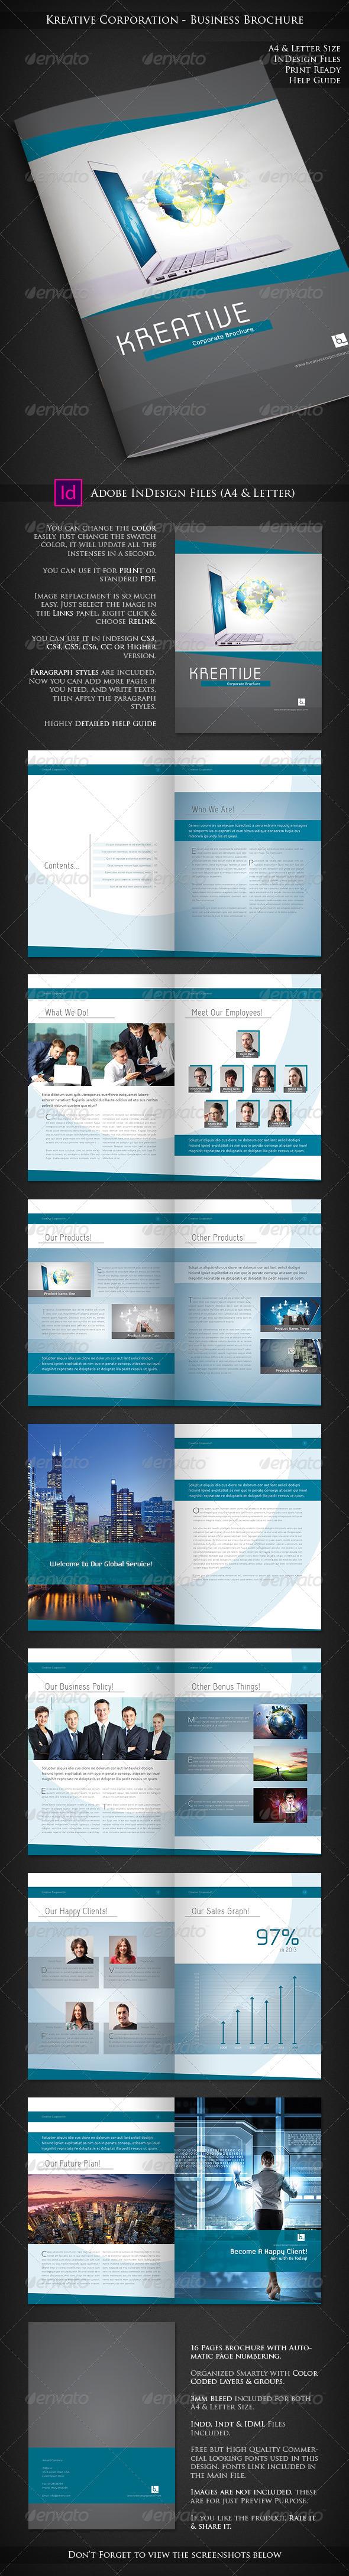 Kreative Corporation - Company Profile Brochure - Corporate Brochures